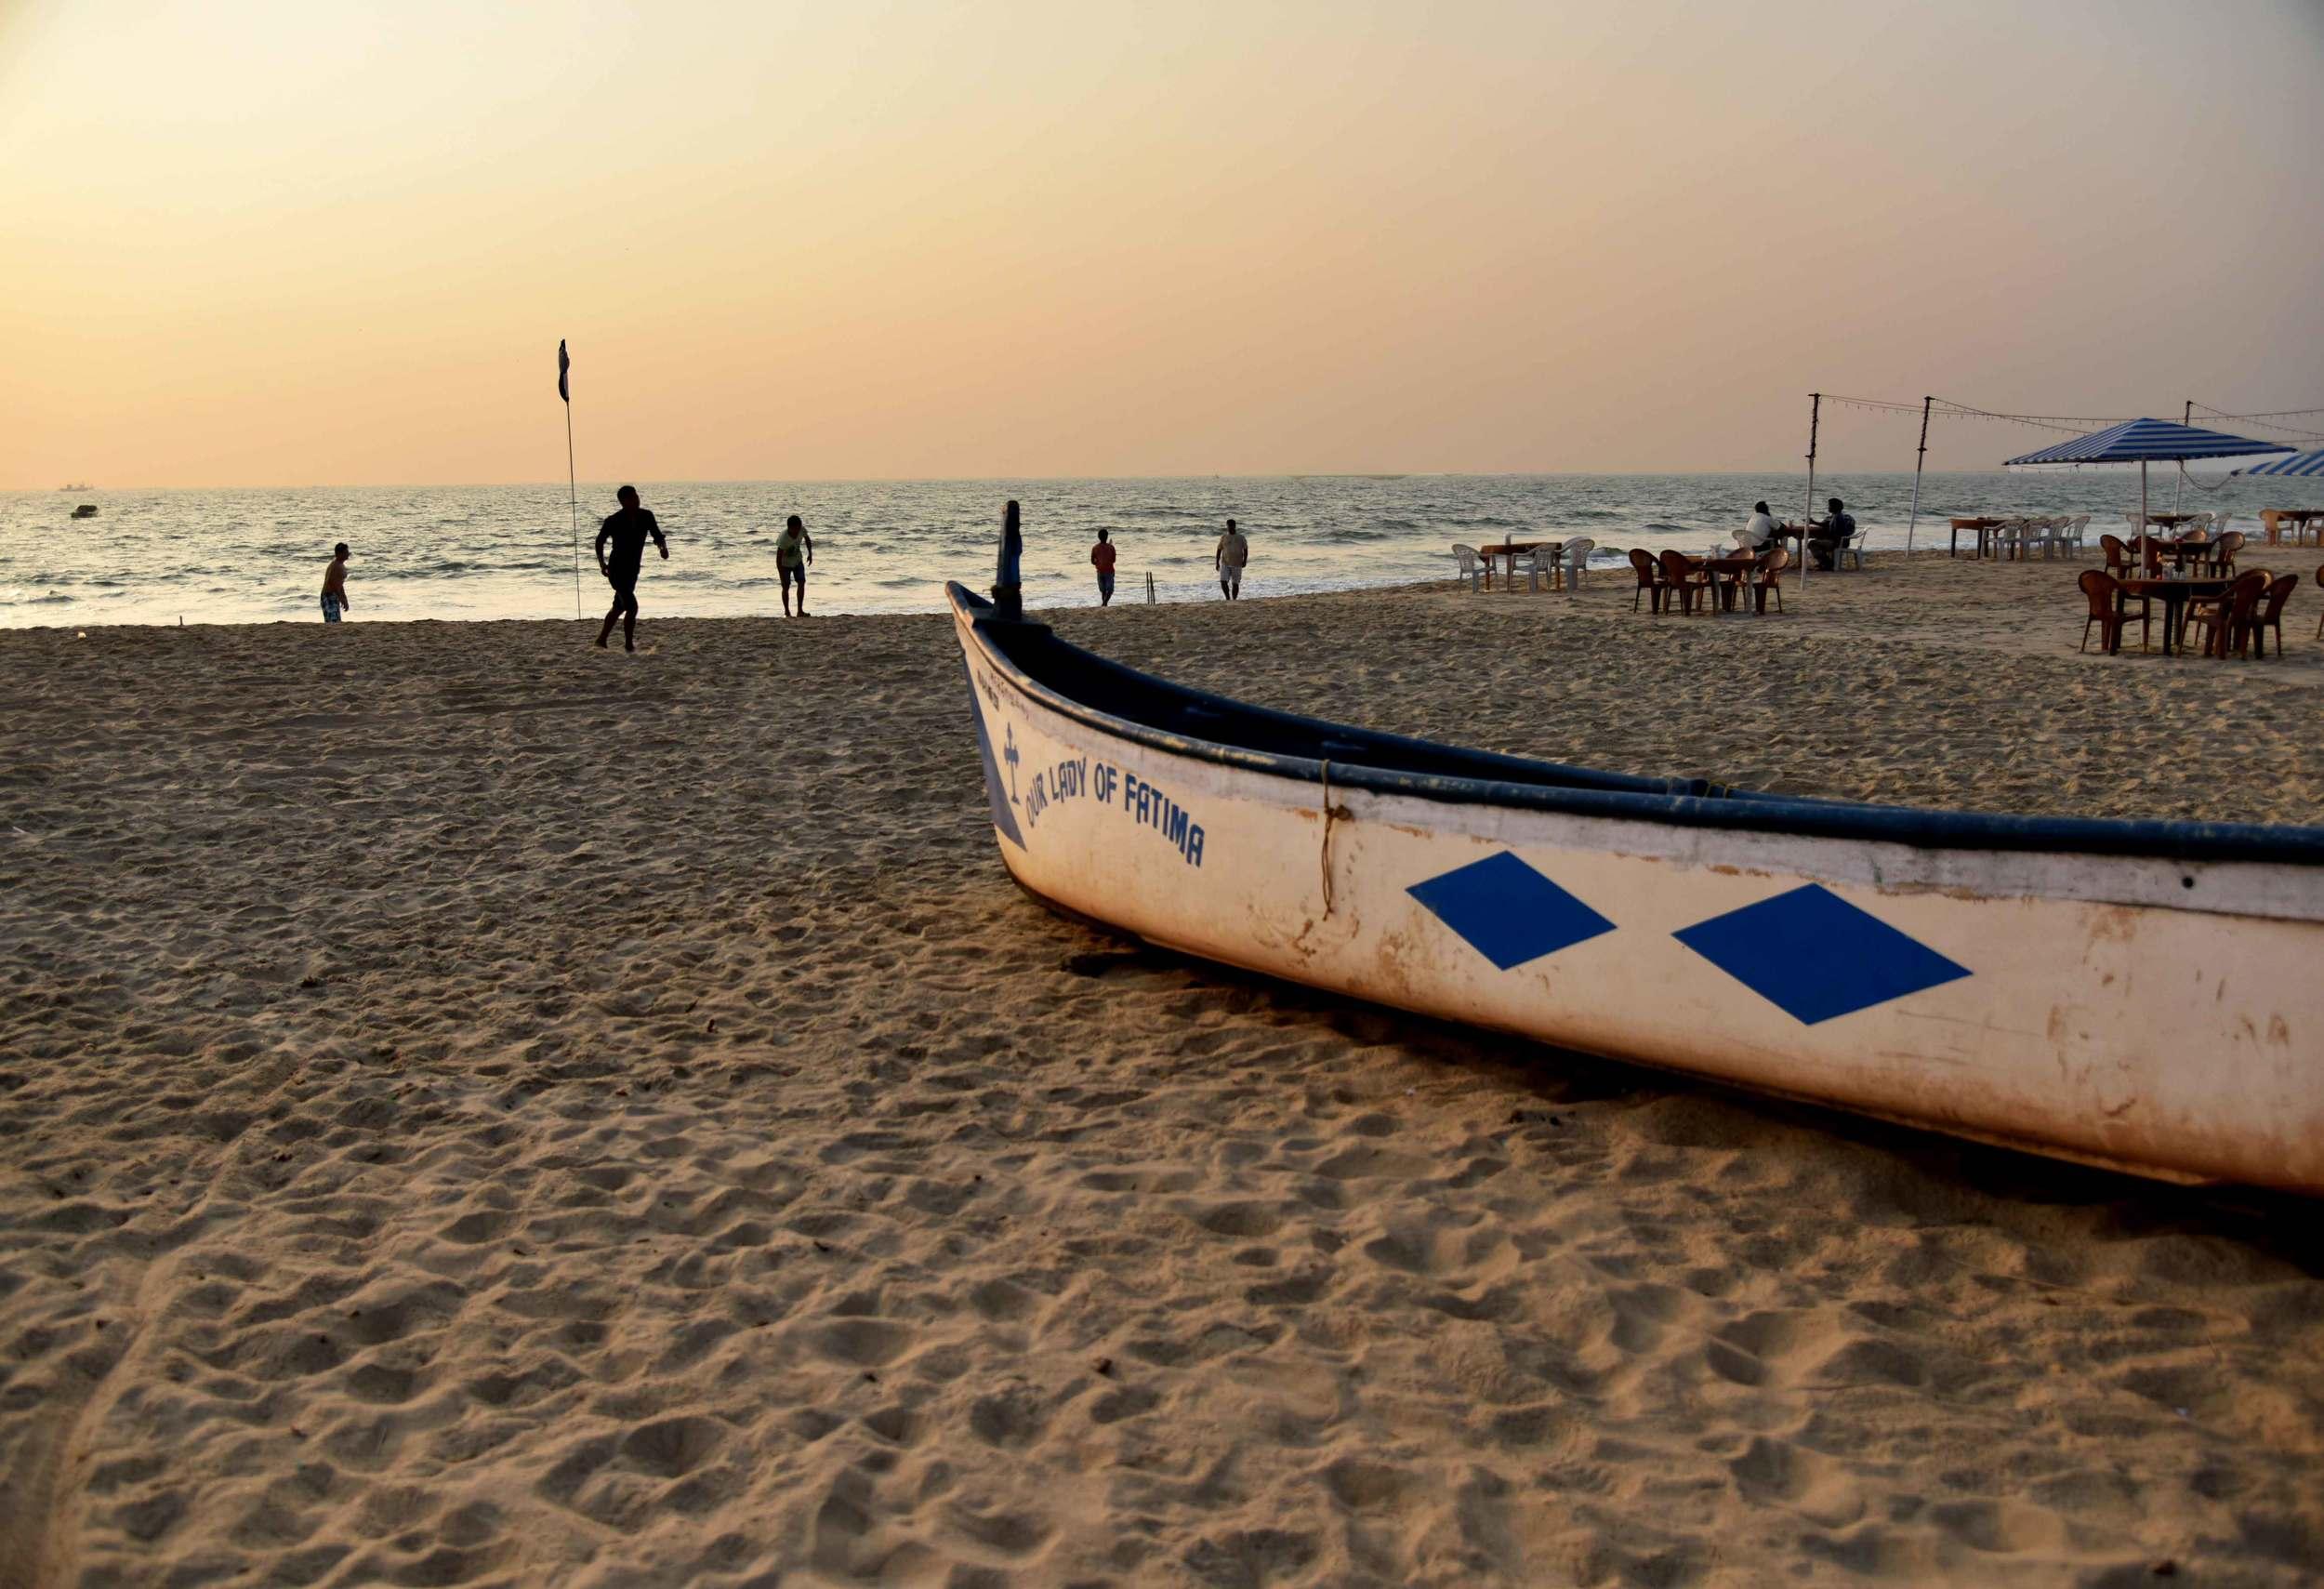 Sunset on the beach. Park Hyatt Hotel, Goa, image©sourcingstyle.com.